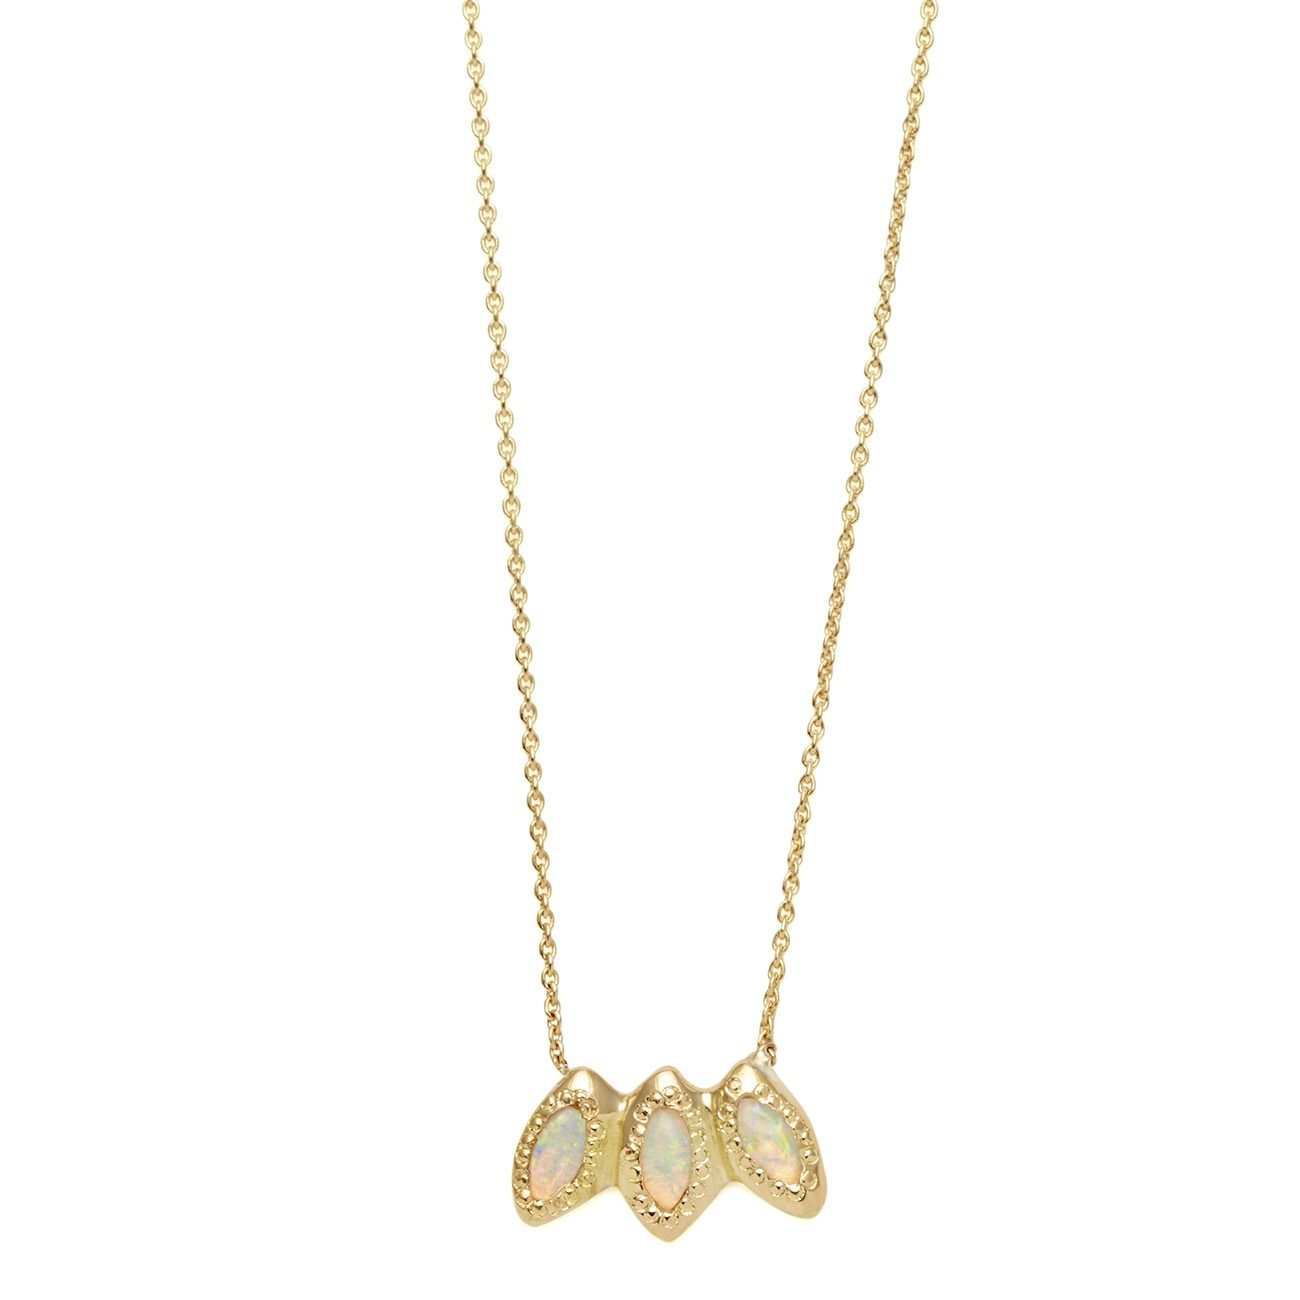 Elisa Solomon - Yellow Gold 3 Marquis Necklace